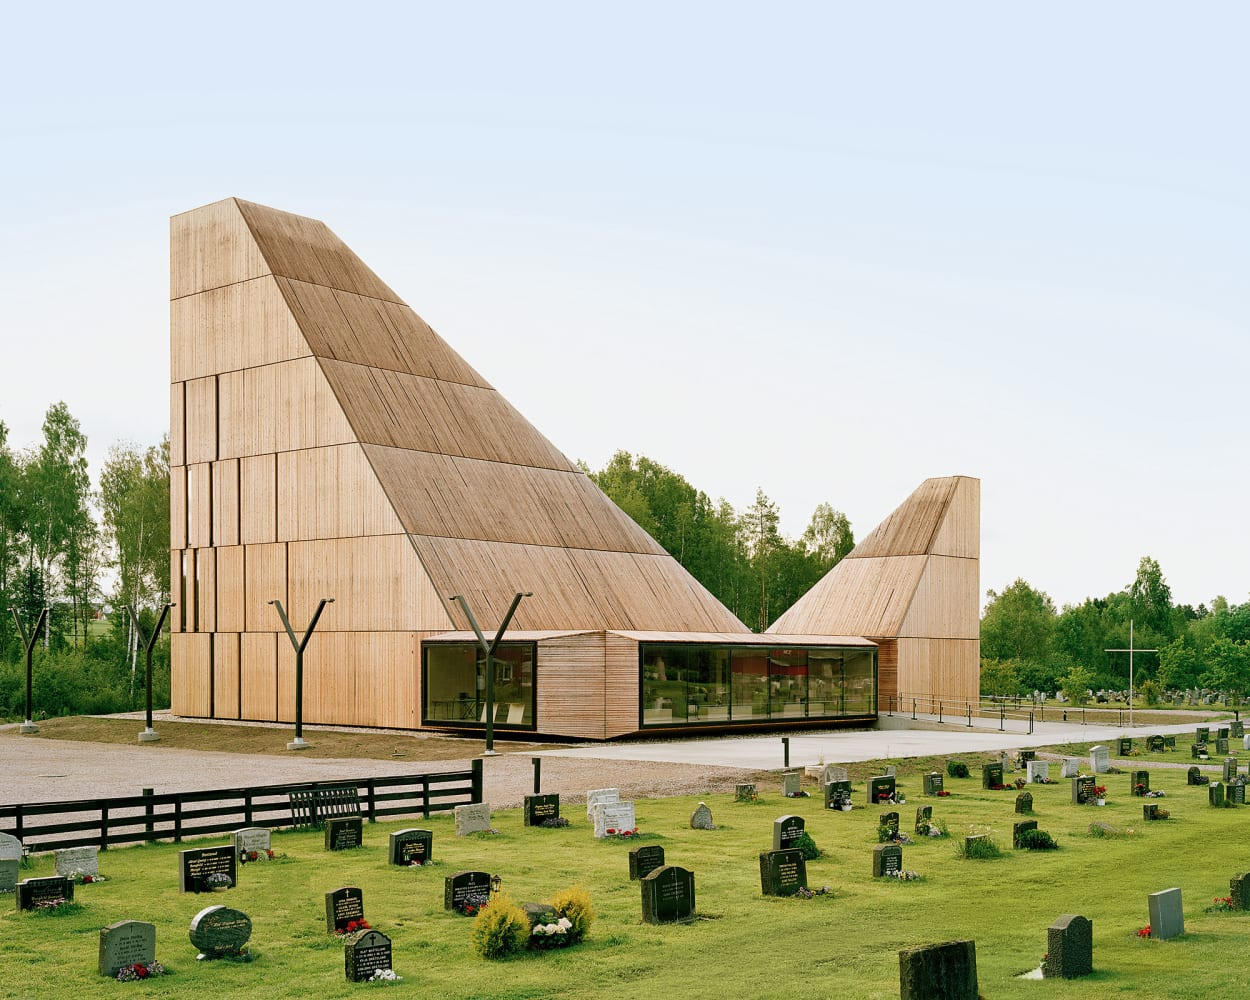 AD Design Award, Architektur, Espen Surnevik, Norwegen